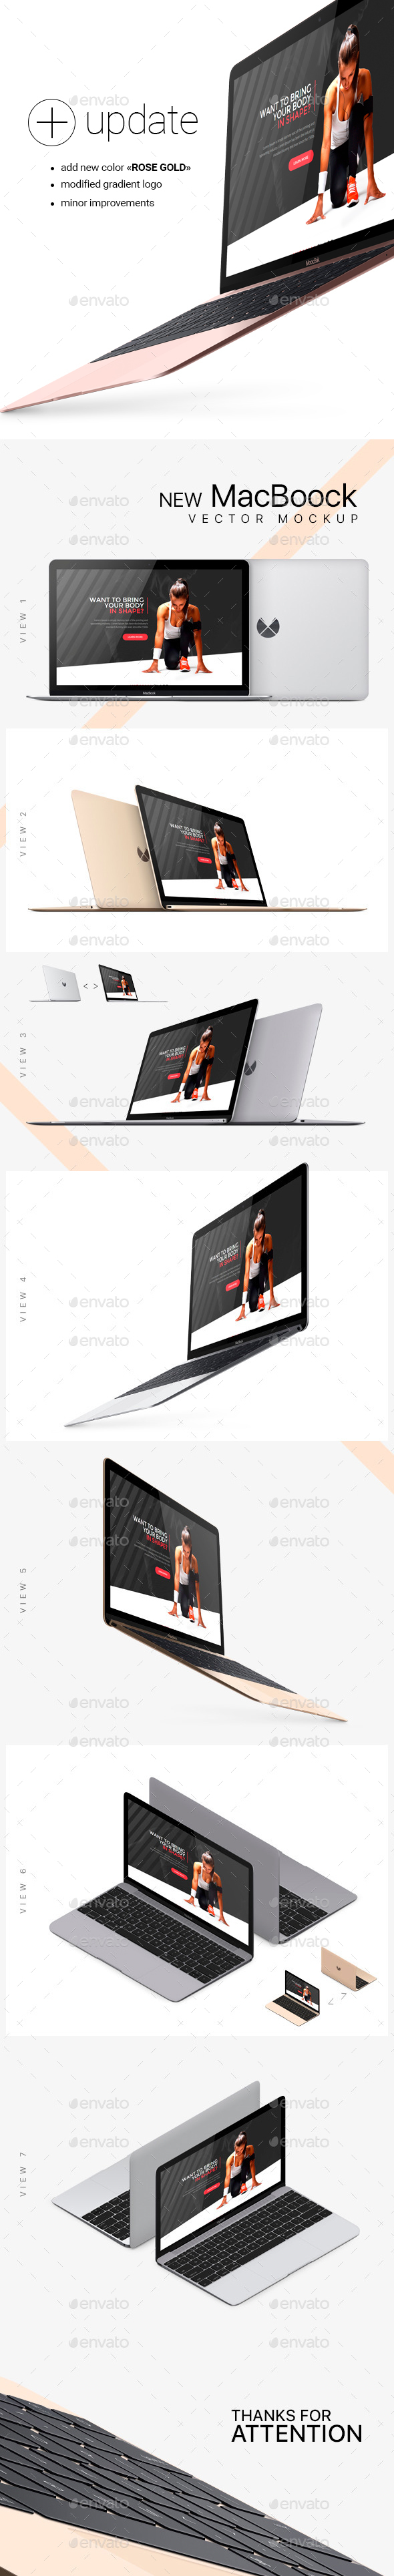 New MacBook Photorealistic Vector Mockup